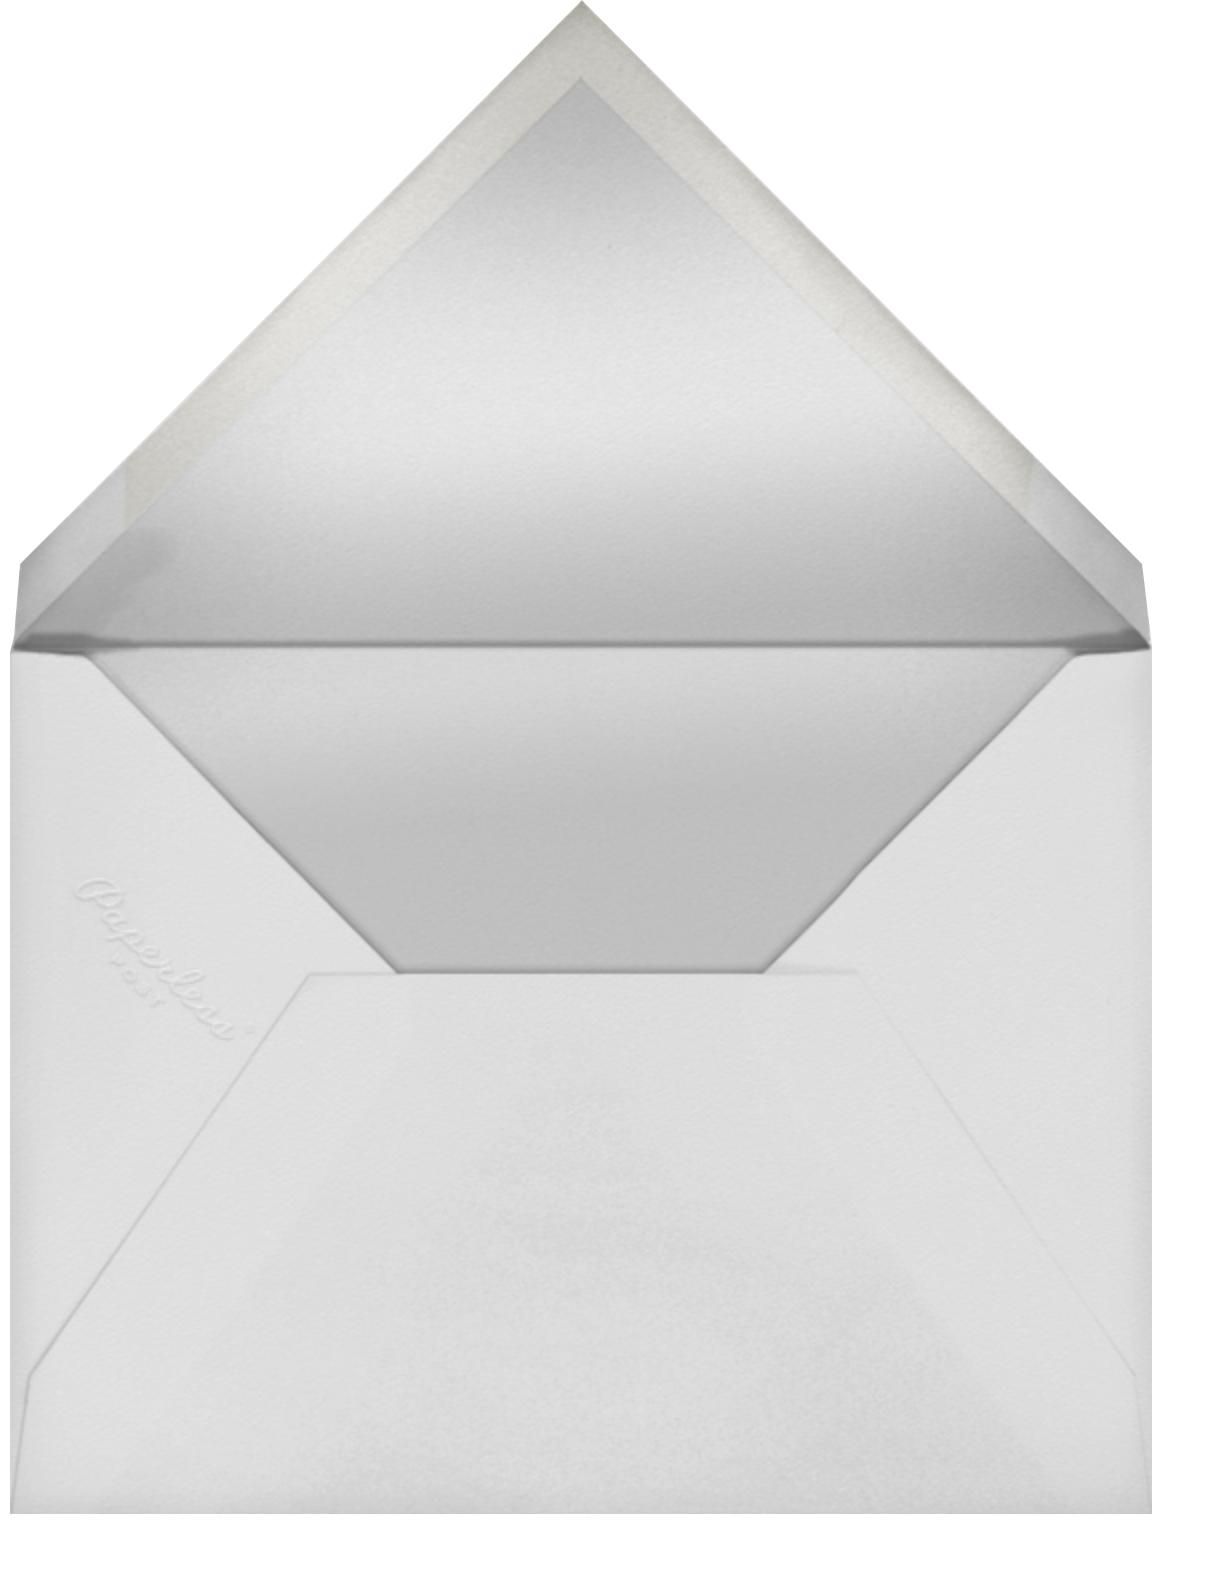 Orangerie (Square) - White - Rifle Paper Co. - Graduation party - envelope back